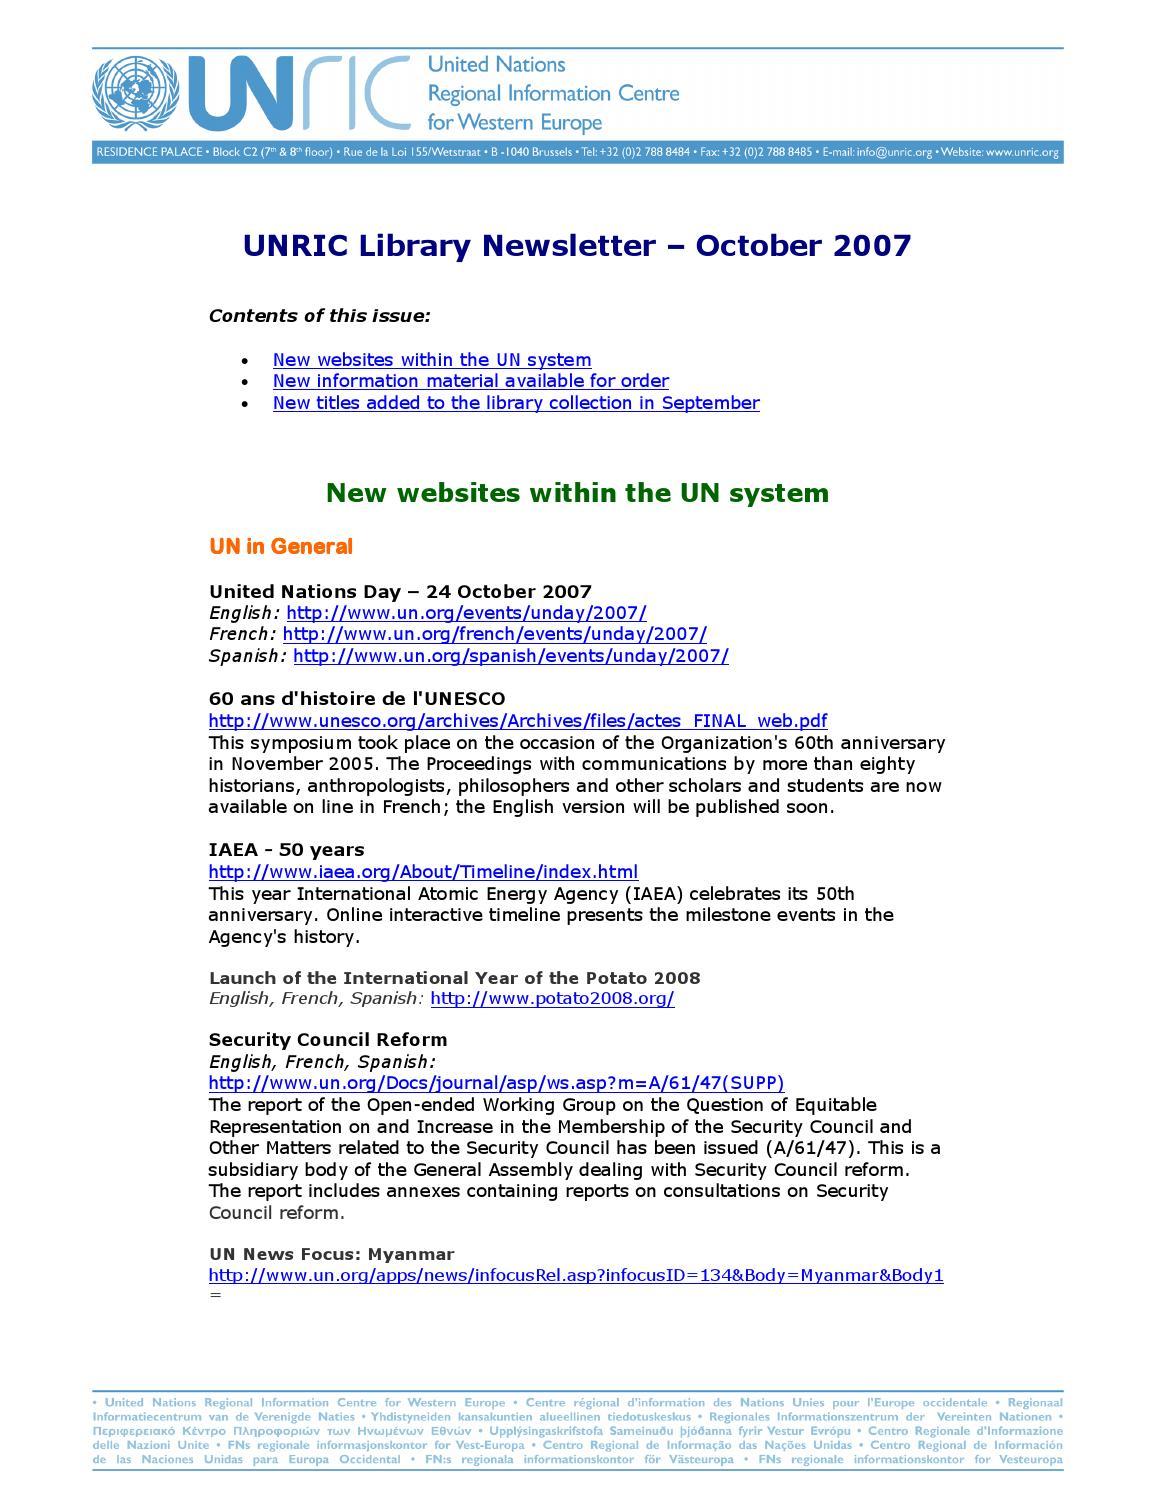 United Nations Organisation Pdf